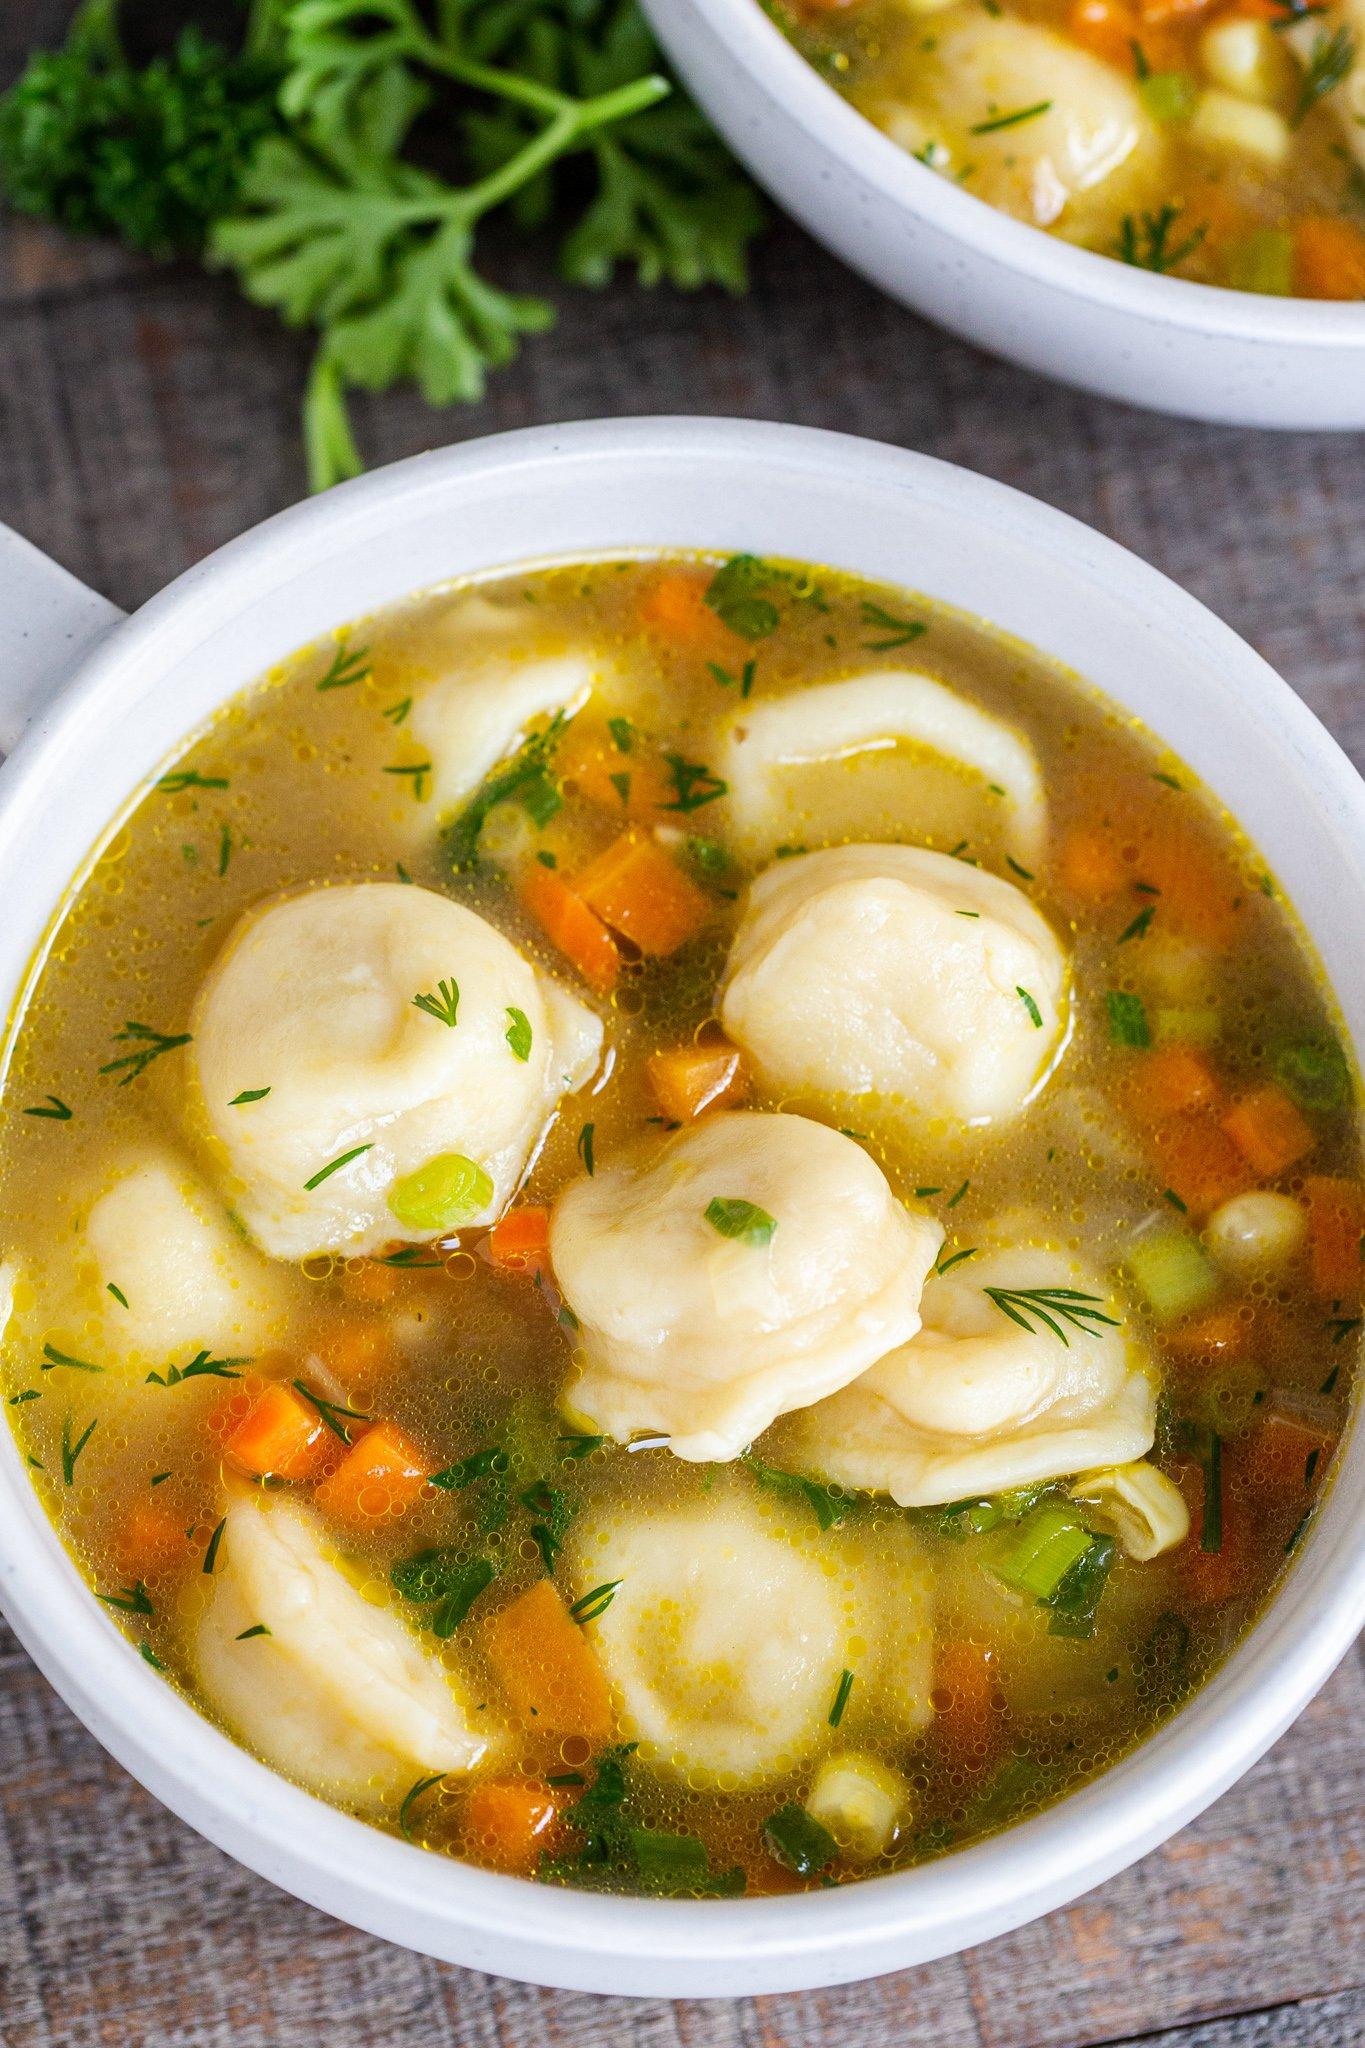 Pelmeni soup in a bowl